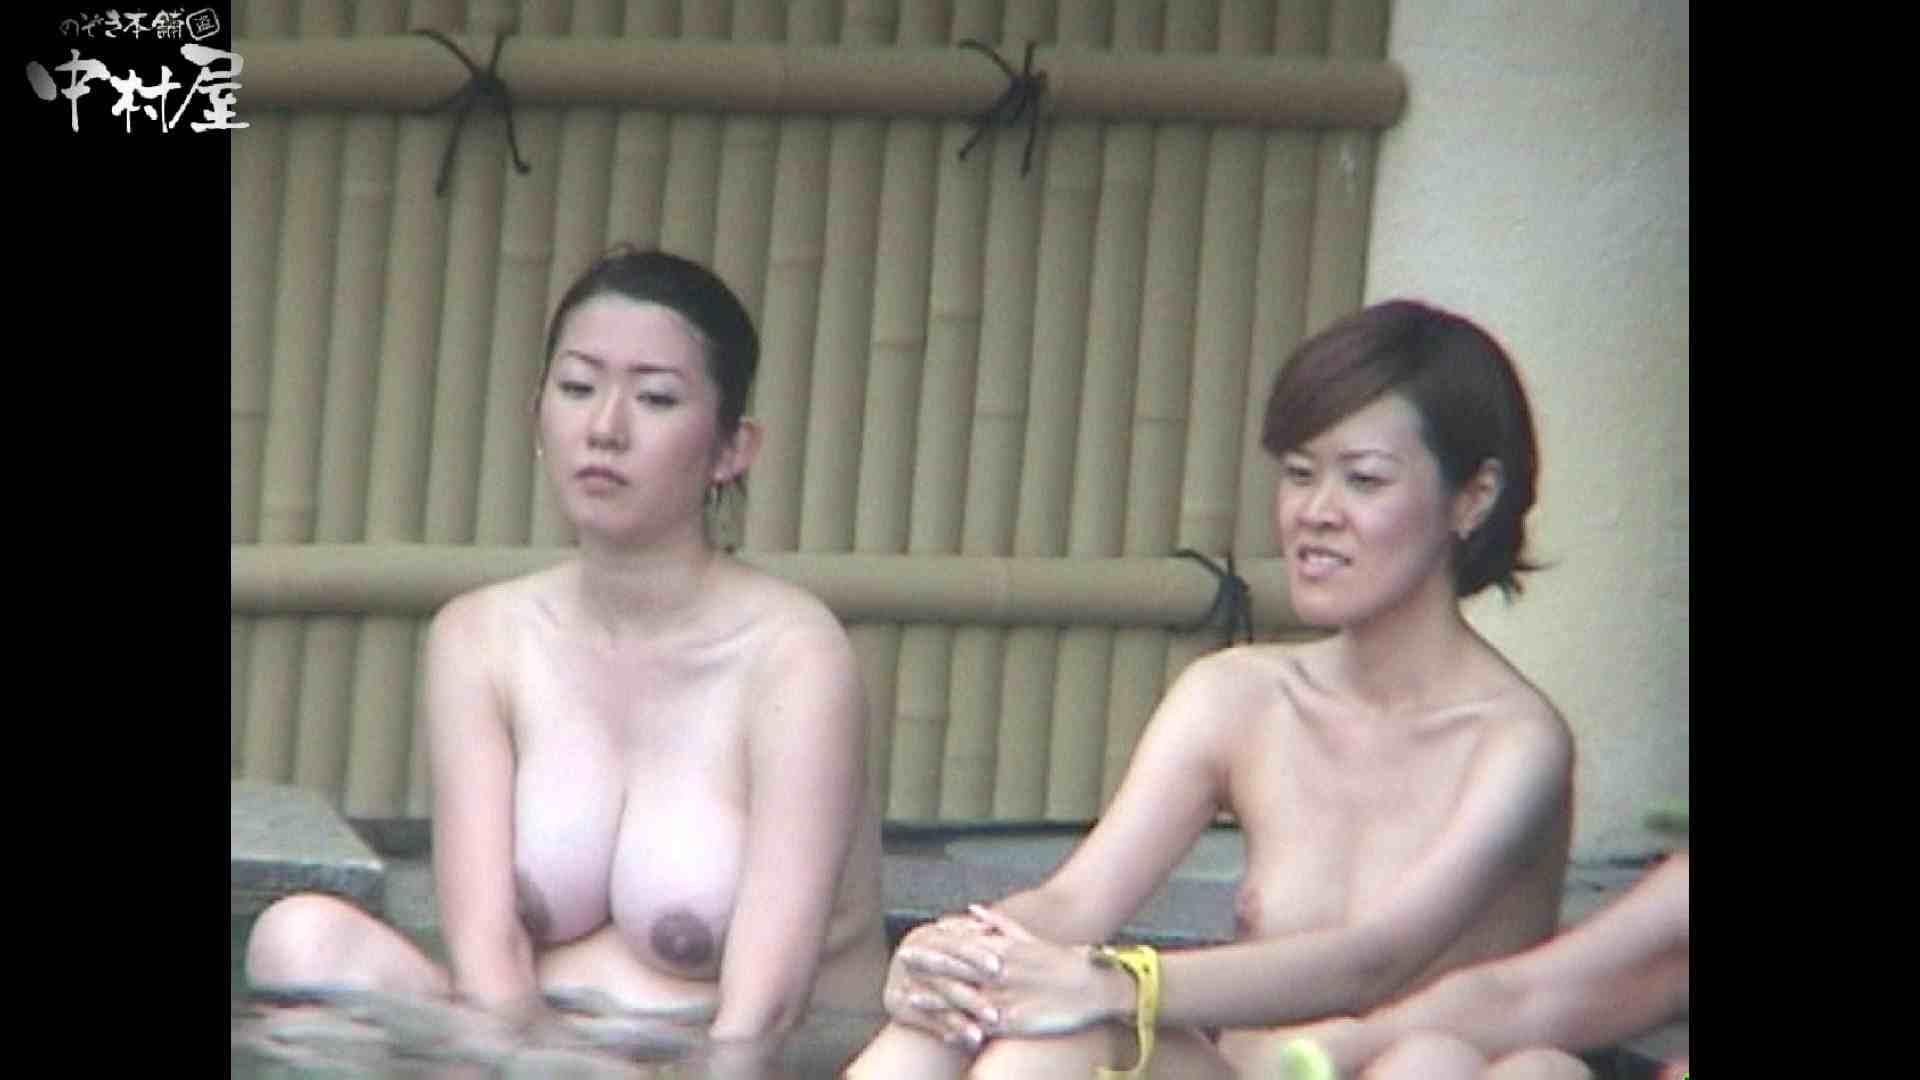 Aquaな露天風呂Vol.961 OL女体  65連発 12